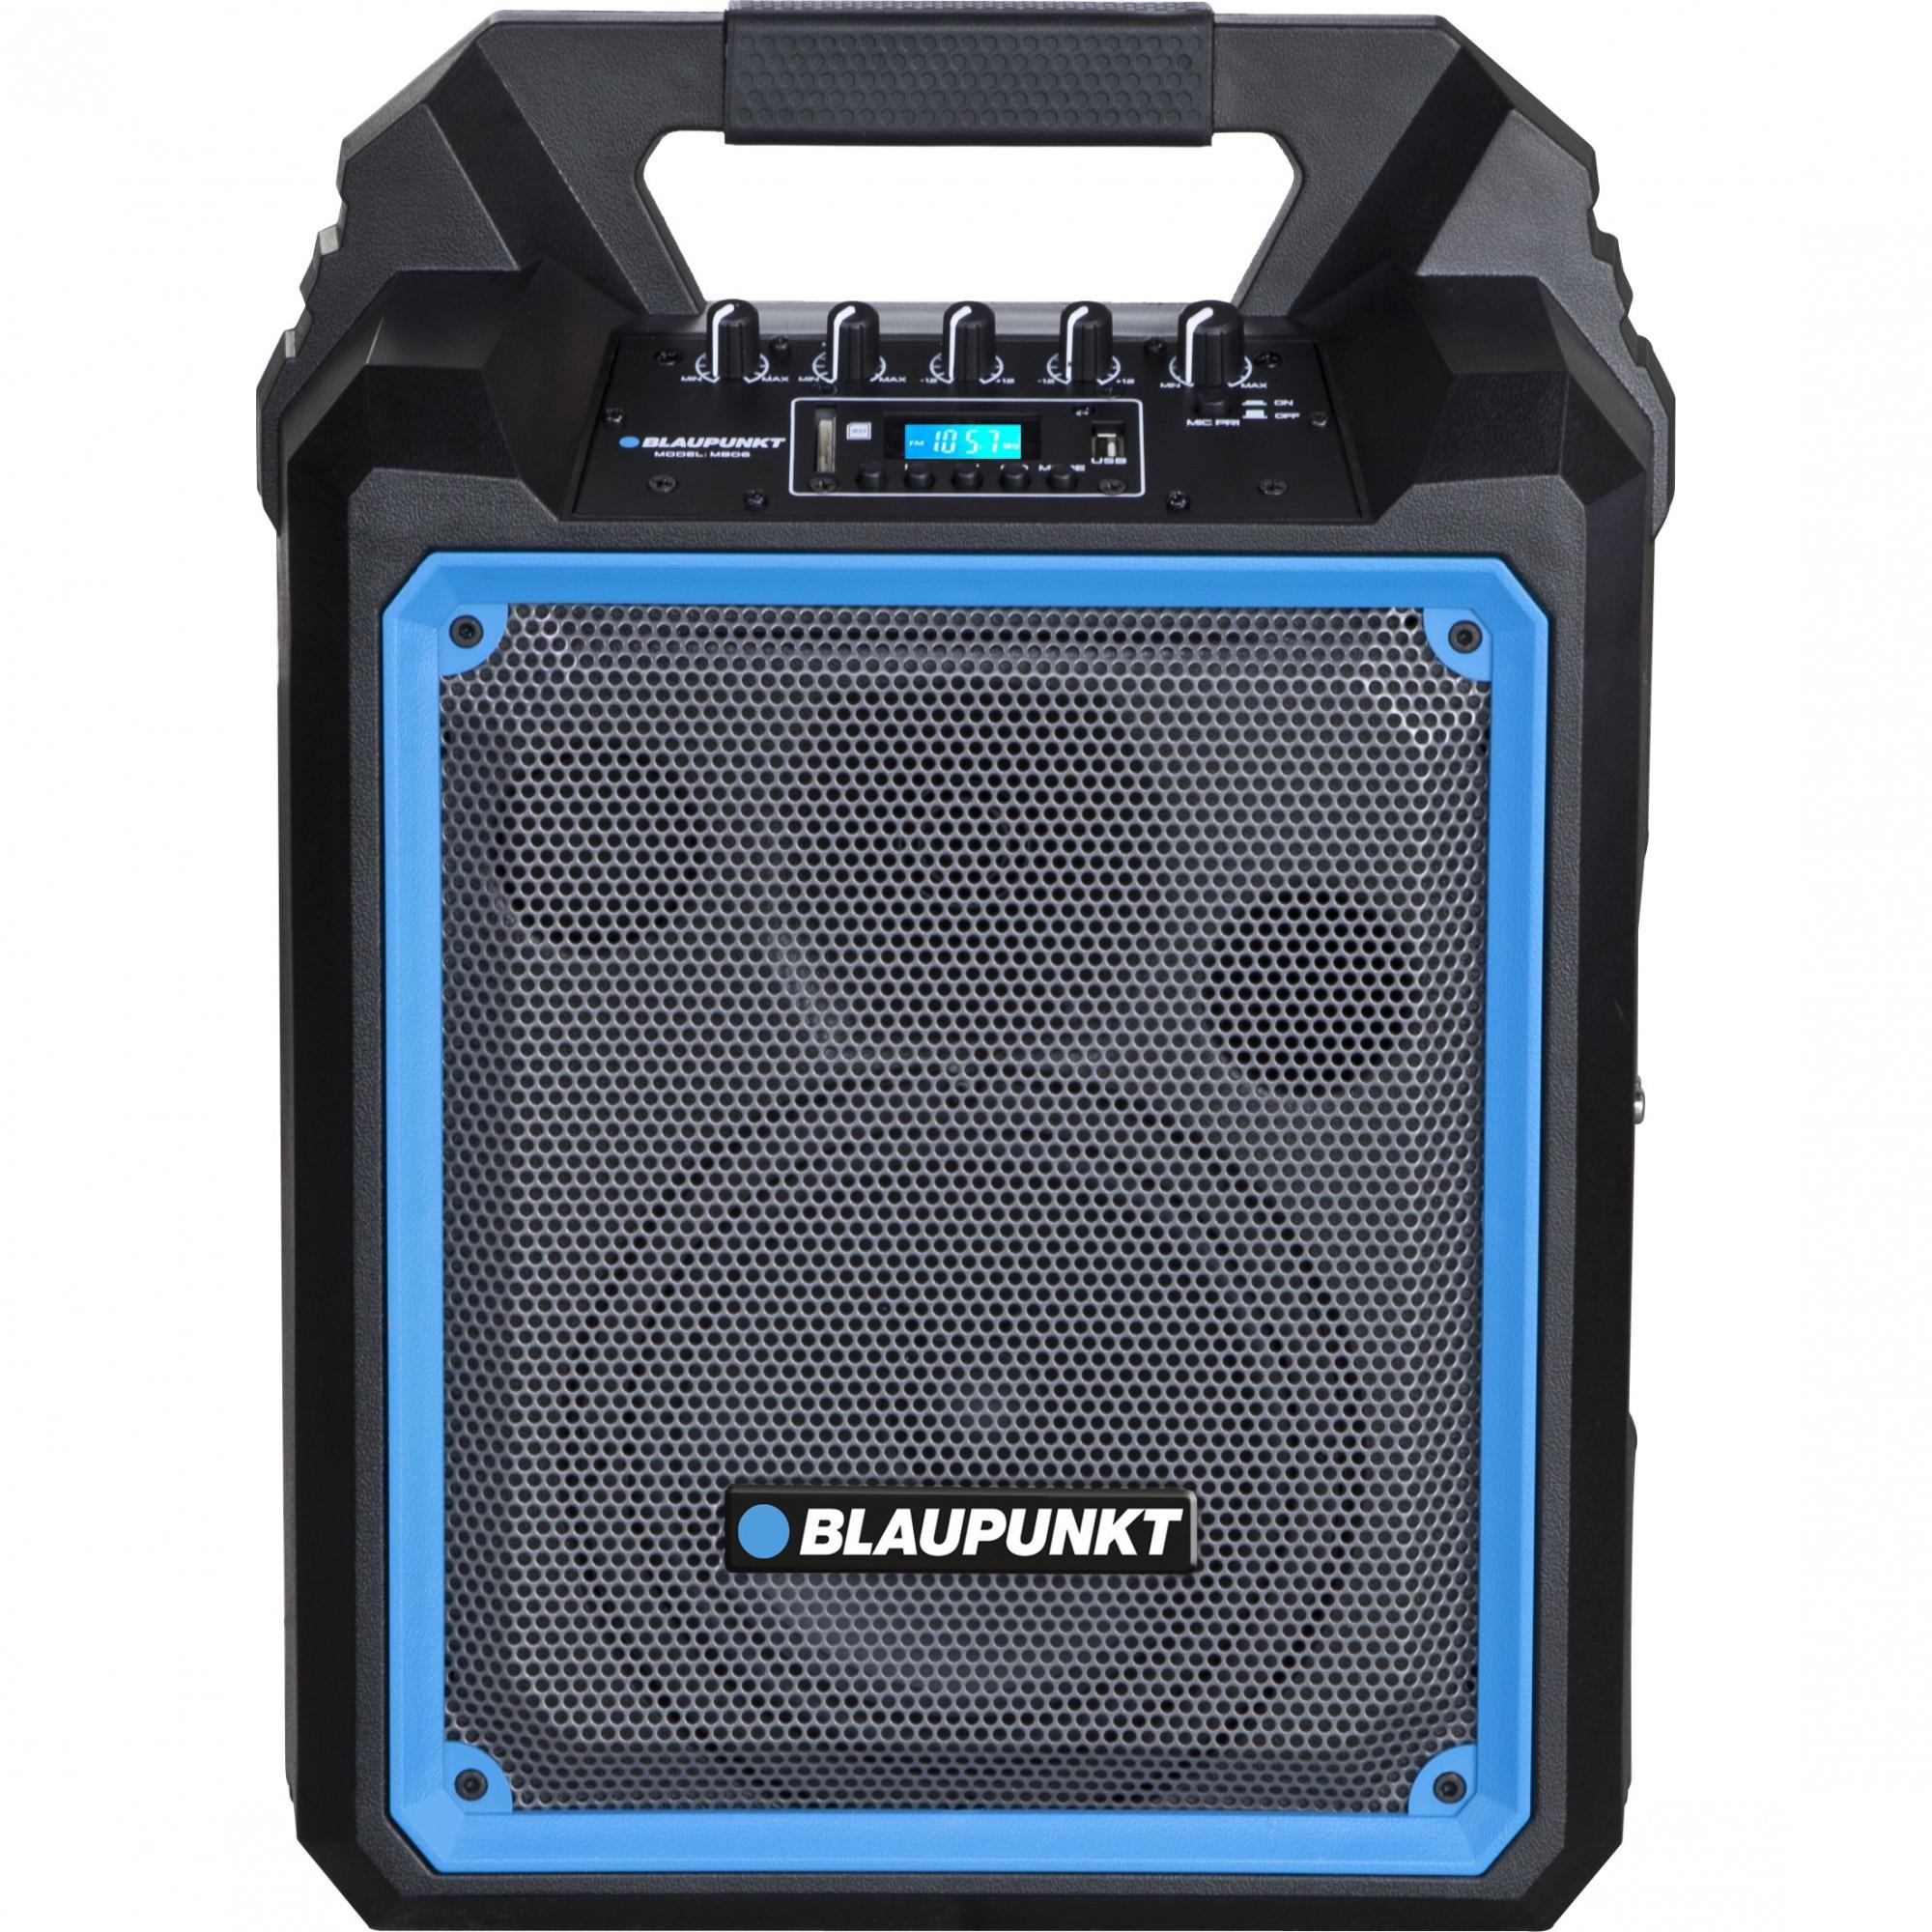 Fotografie Boxa portabila Blaupunkt, MB06, Bluetooth, FM/SD/USB/AUX/KARAOKE, 500W